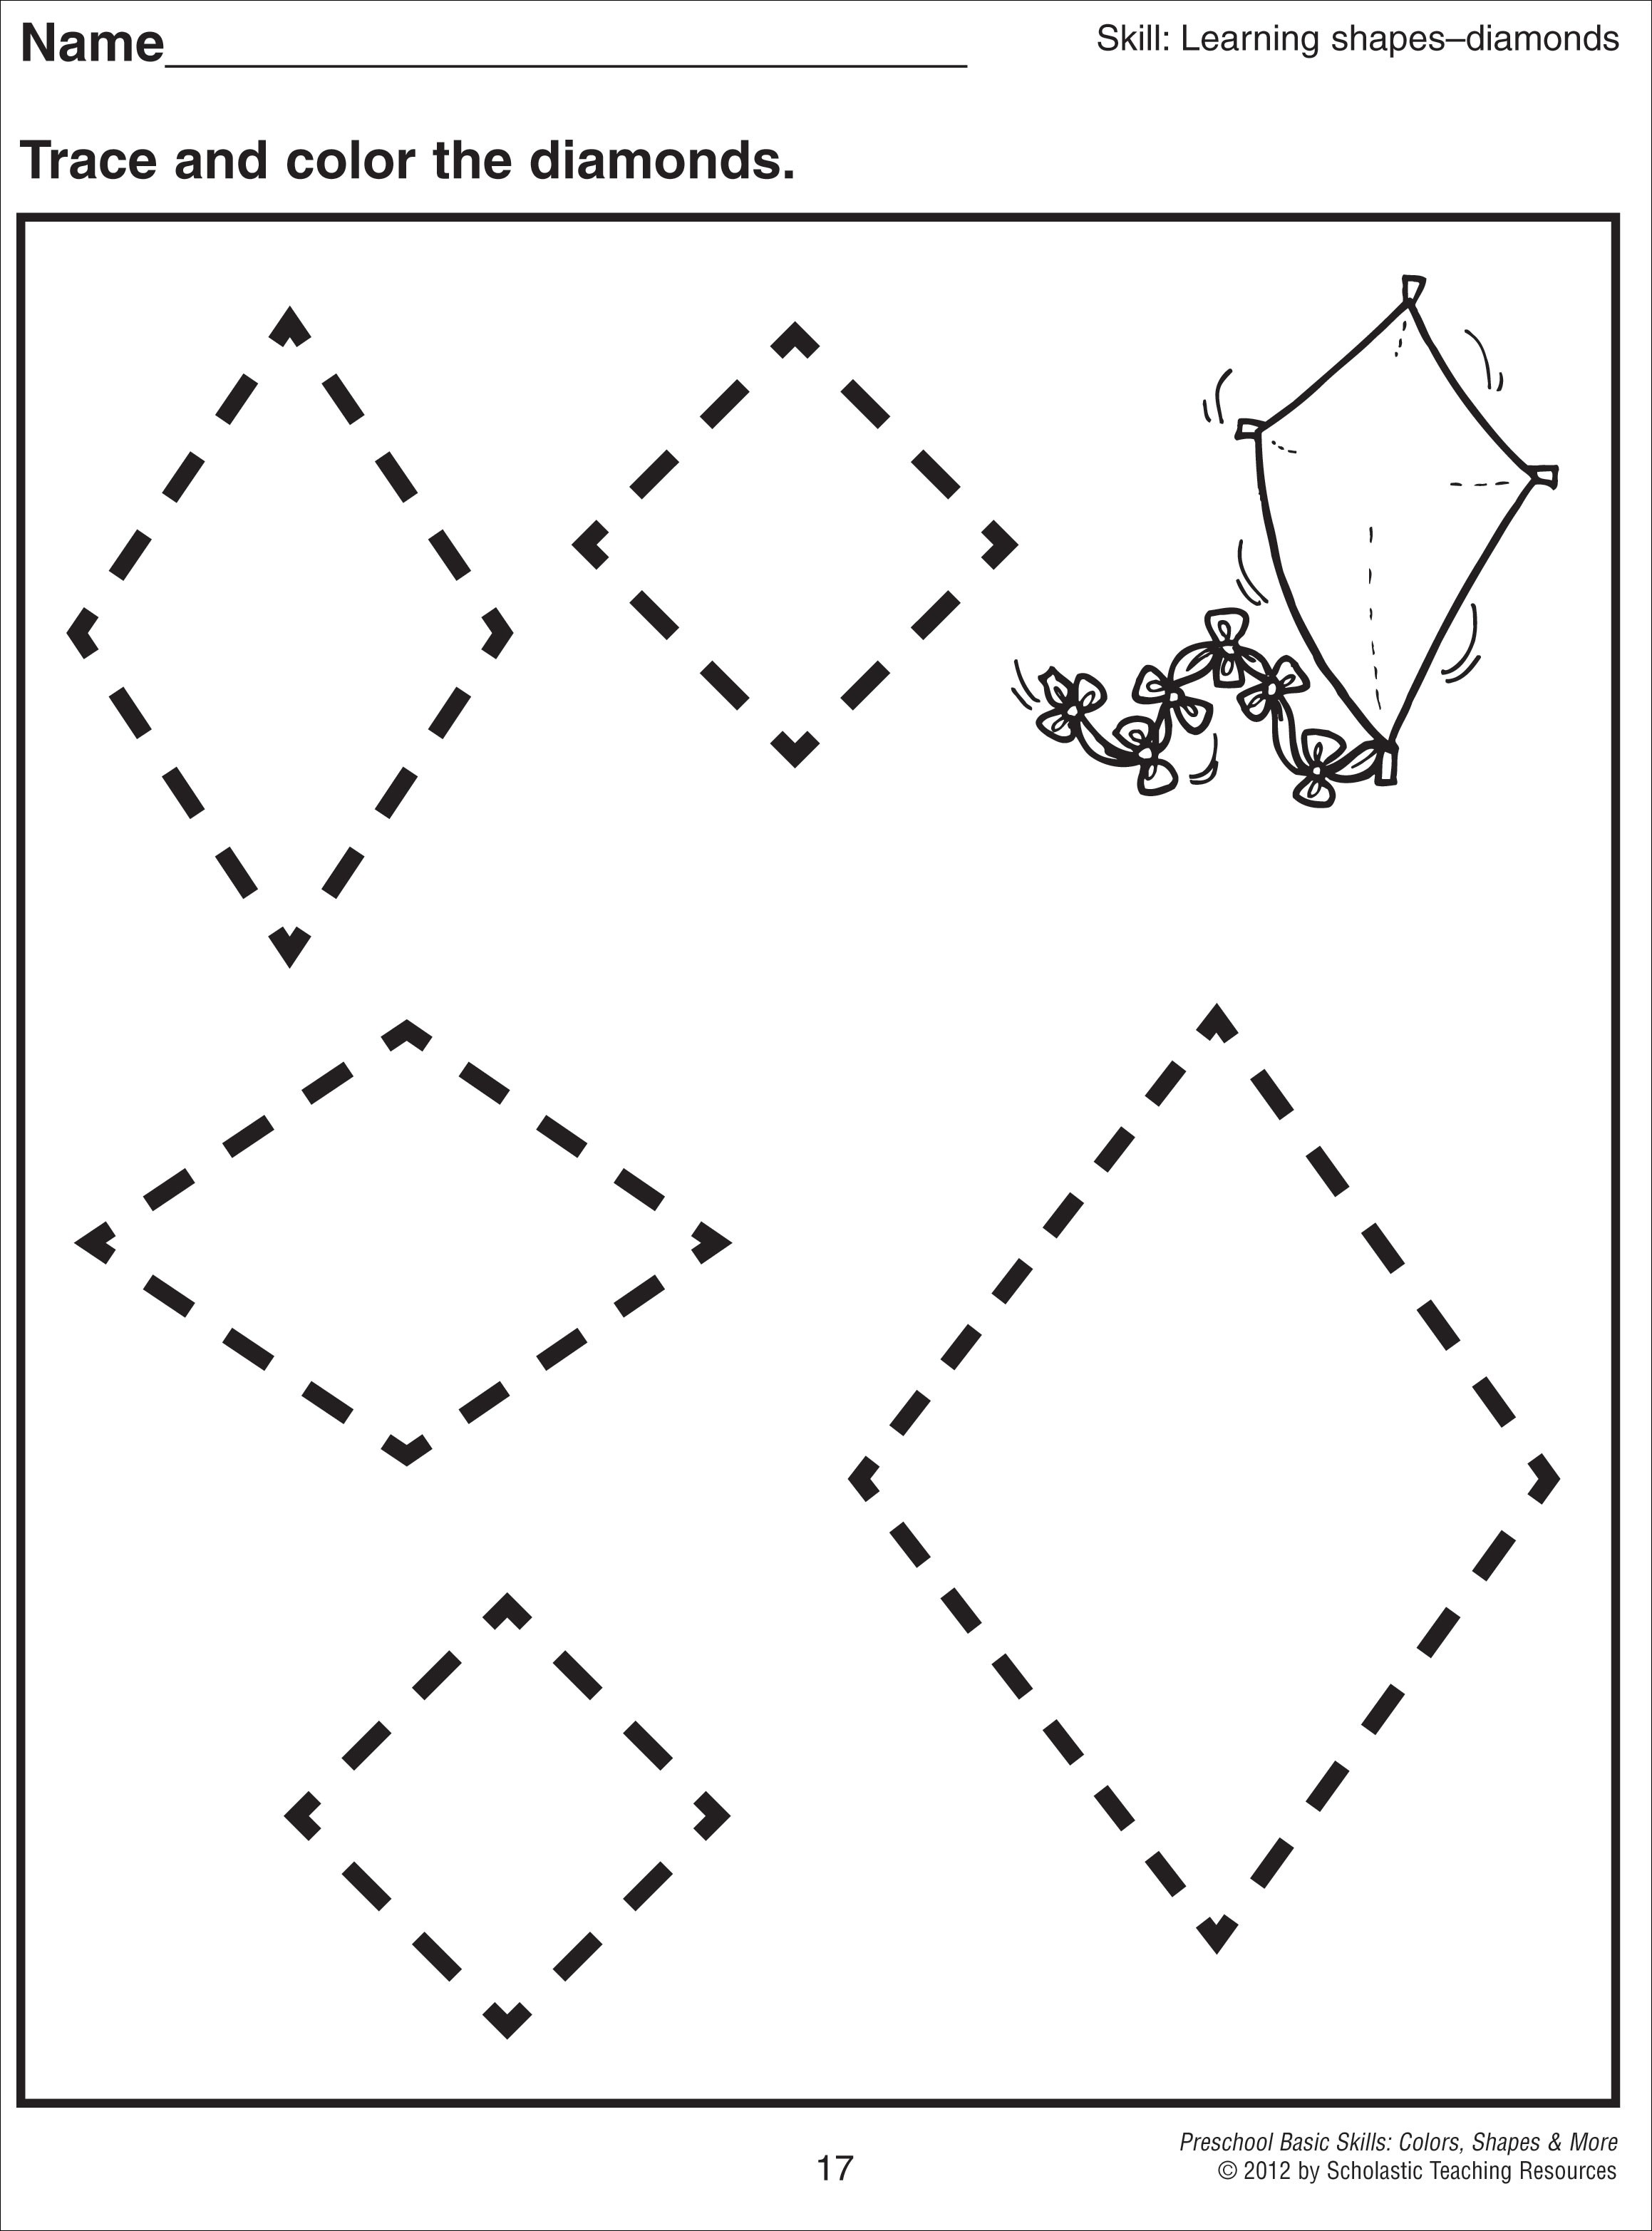 Printables Drawing Rhombus Worksheet rhombus worksheet woodleyshailene free printable shape worksheets abitlikethis